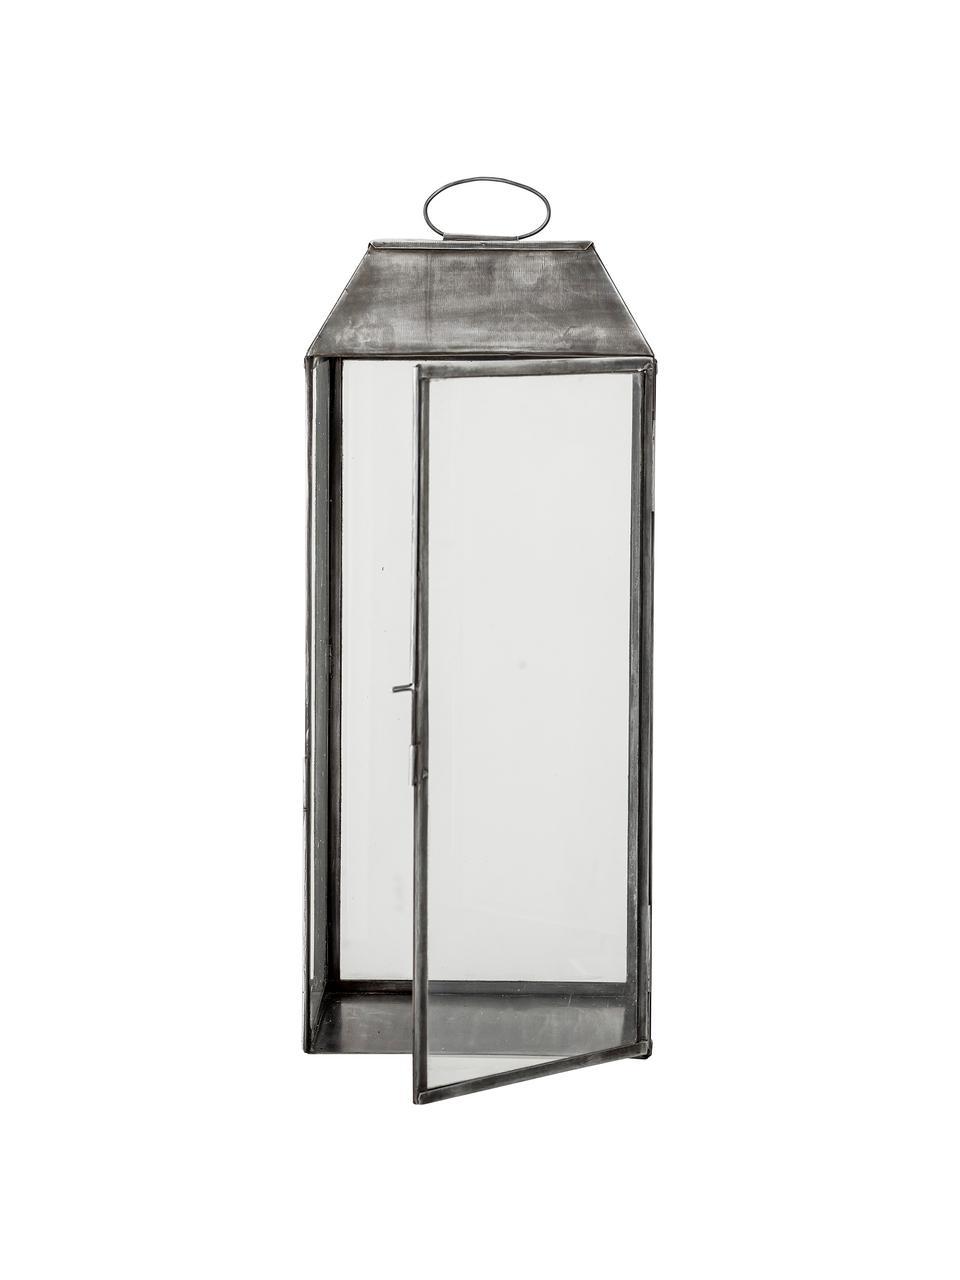 Lanterna in metallo Gagriel, Struttura: metallo, Argentato con finitura antica, Larg. 20 x Alt. 48 cm